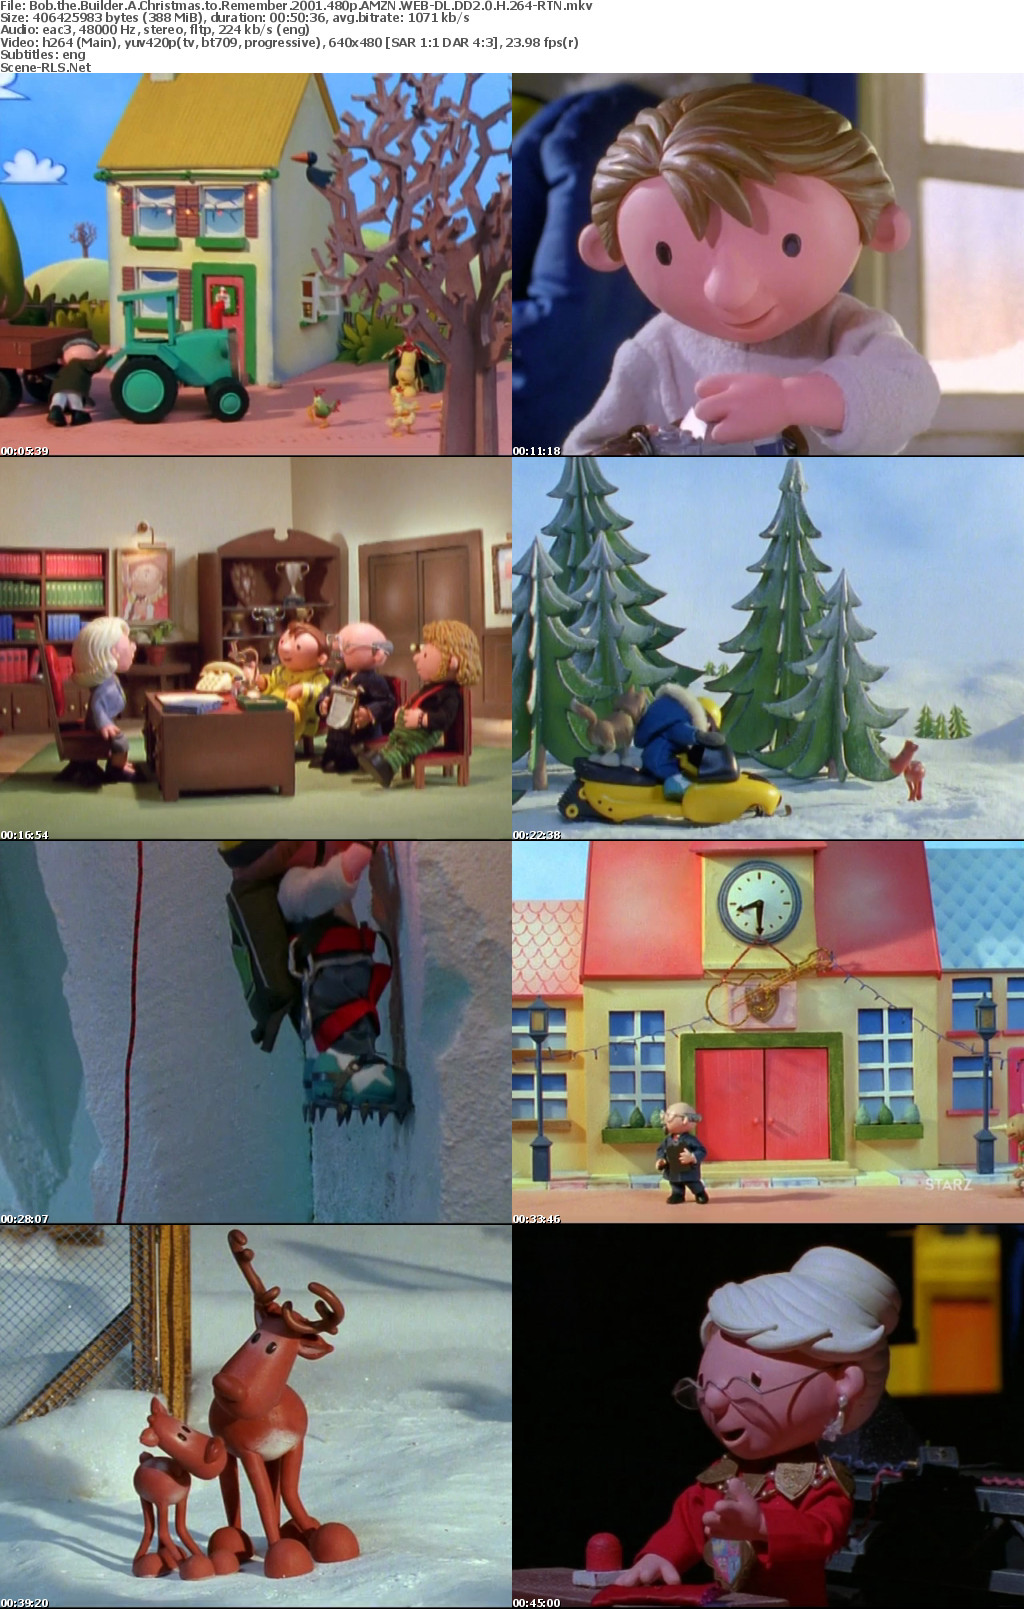 links screenshot imdb subtitle bob the builder a christmas to remember - Bob The Builder A Christmas To Remember